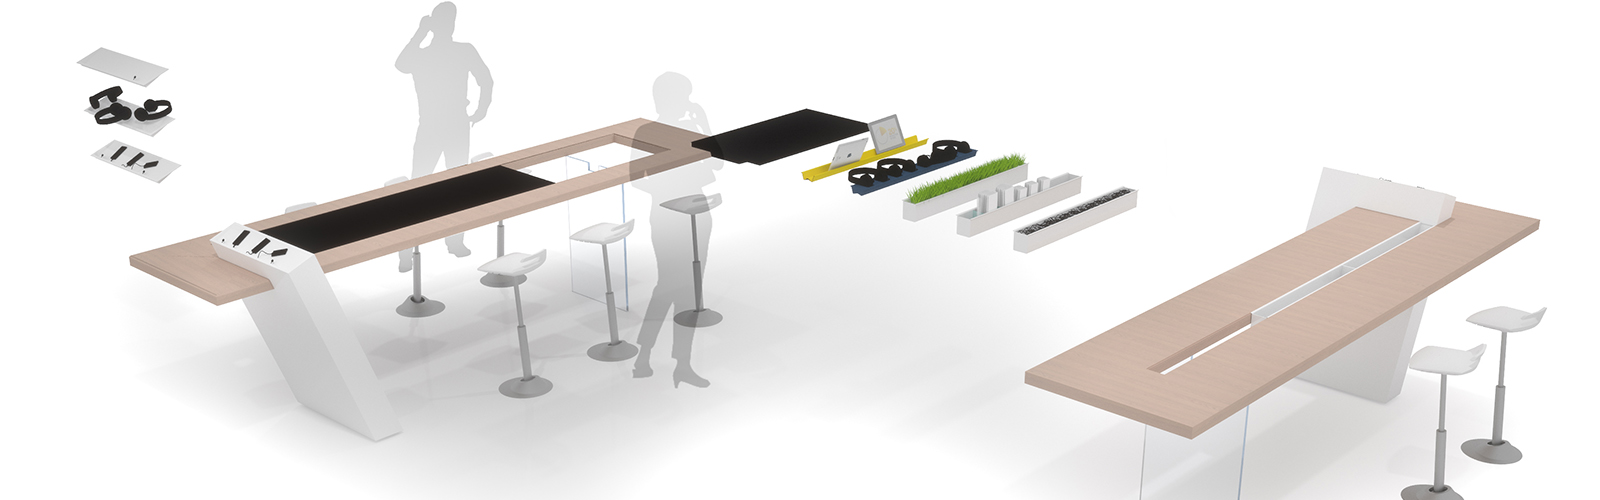 Braunwagner Produkt Industrie Mobility Design Modular table system 2017